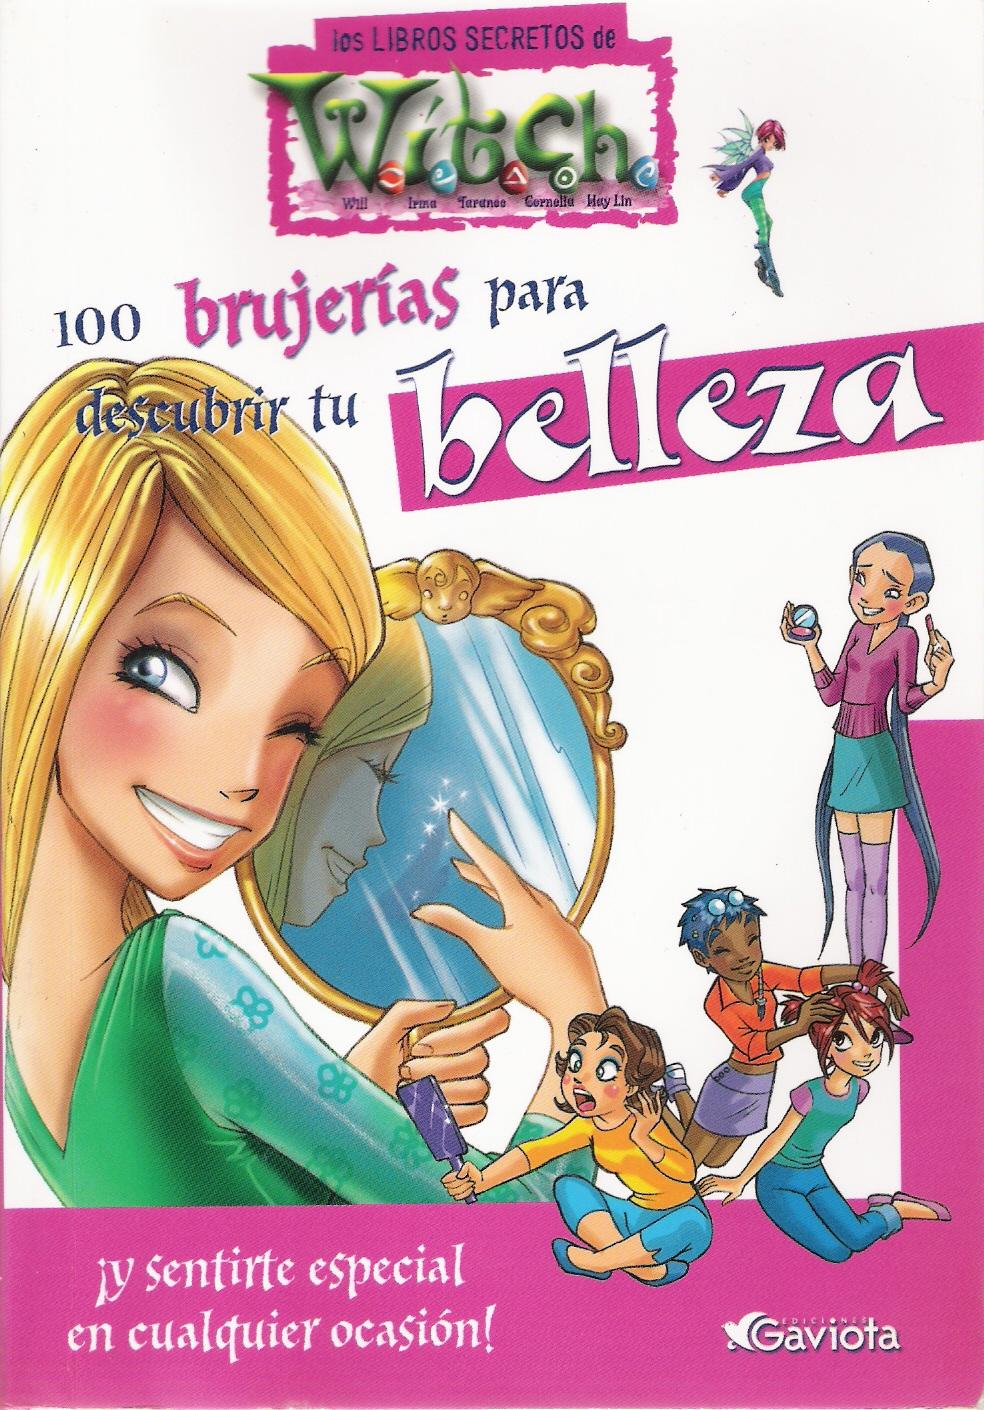 100 BRUJERIAS PARA DESCUBRIR TU PROPIA BELLEZA